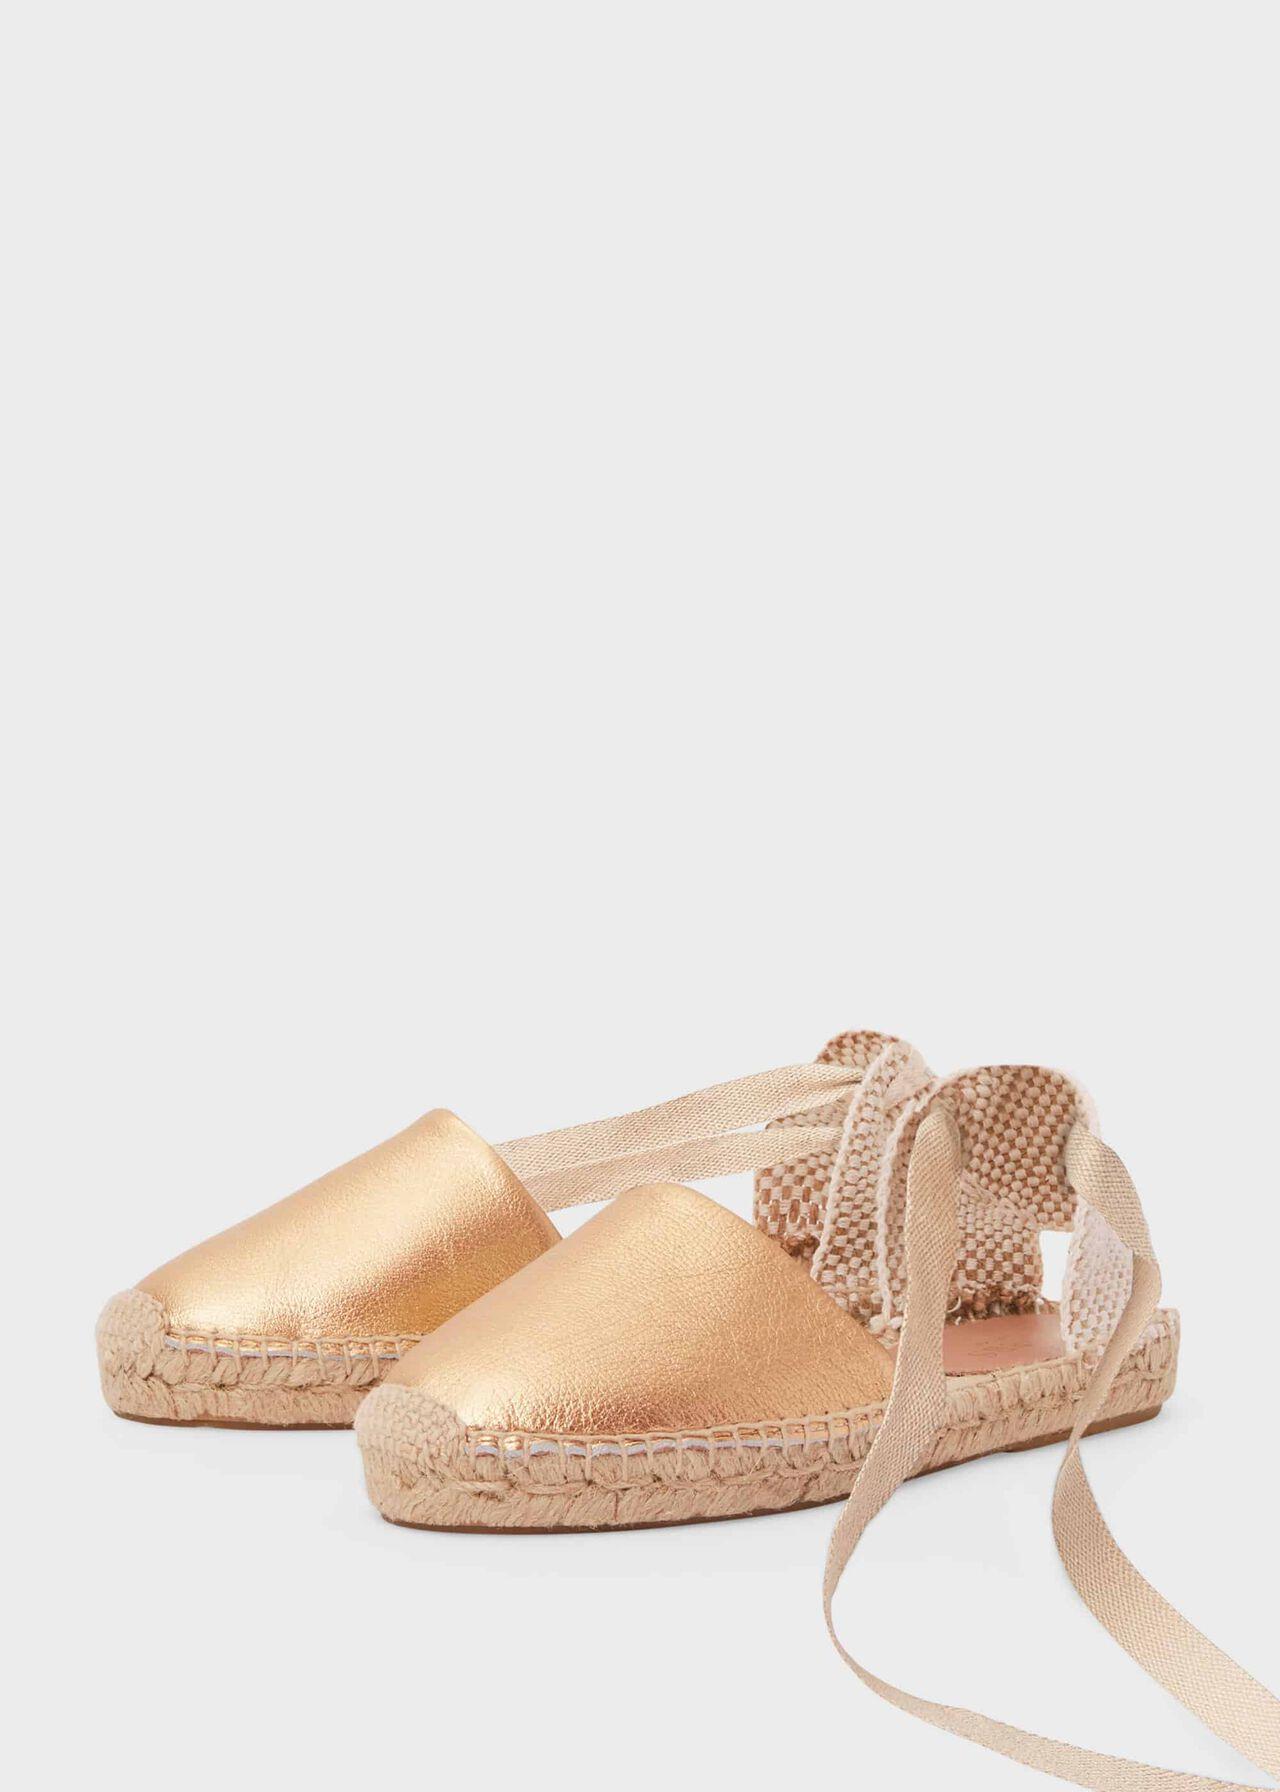 Louisa Leather Flat Espadrilles Gold